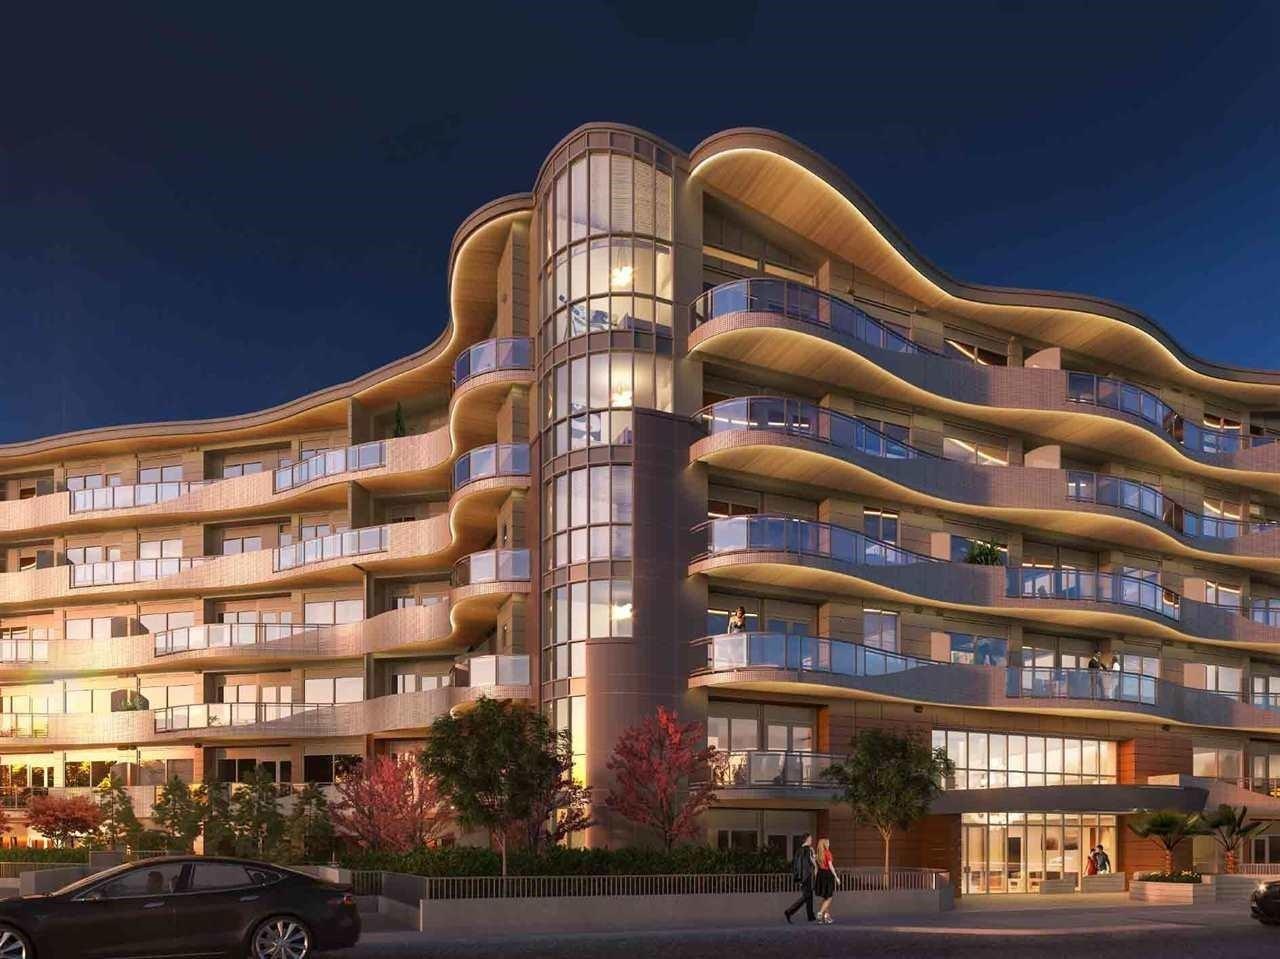 502 20416 PARK AVENUE - Langley City Apartment/Condo for sale, 3 Bedrooms (R2603603) - #1